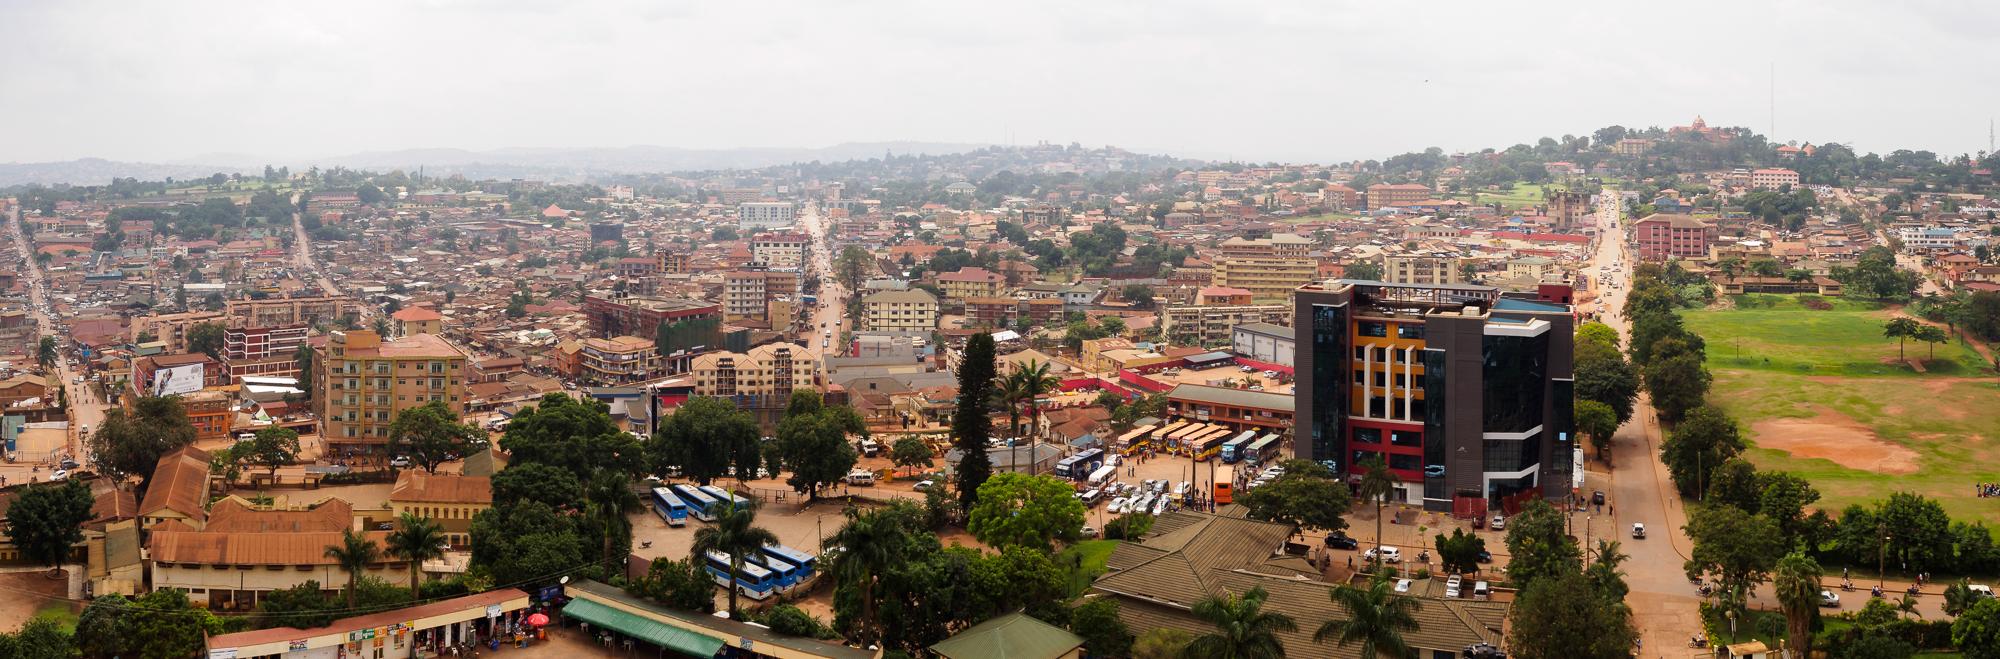 Panorama von Kampala